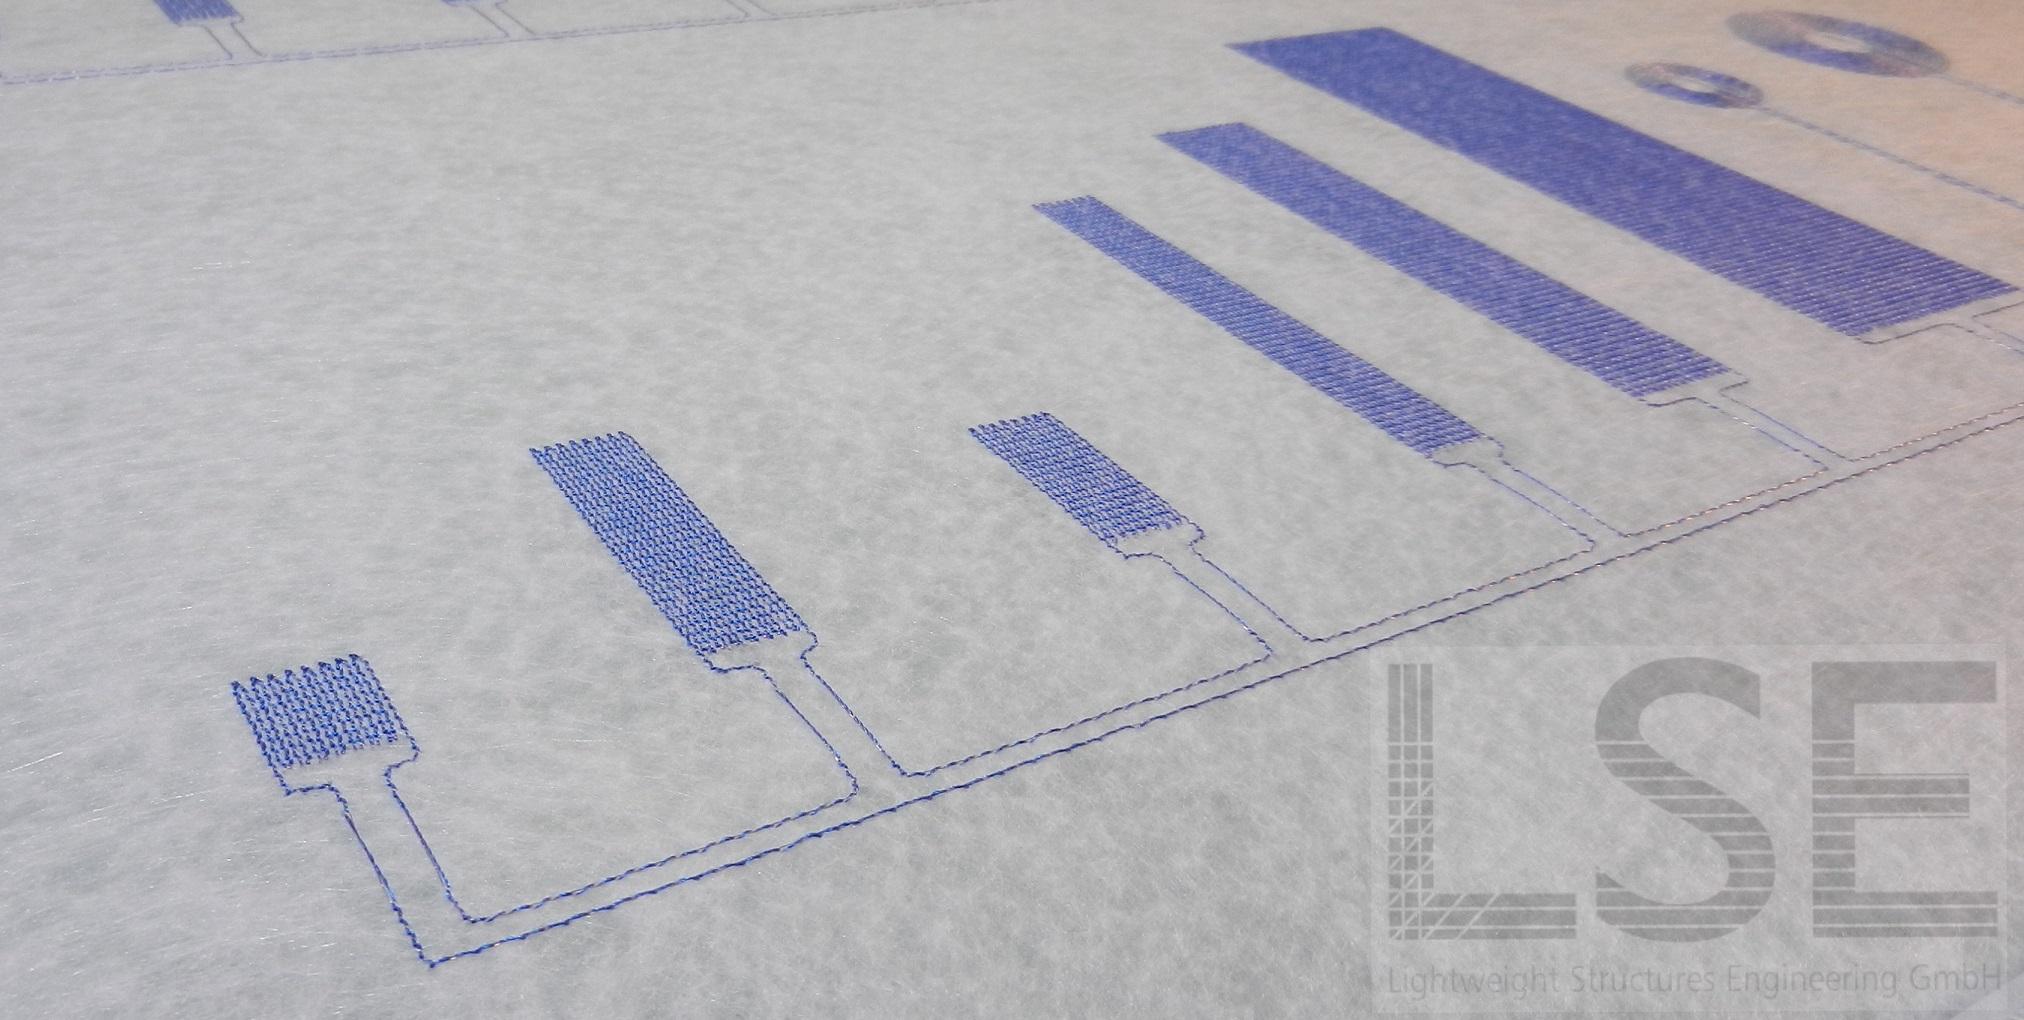 gestickte Sensoren - Gesamtgeometrien - LSE - Chemnitz